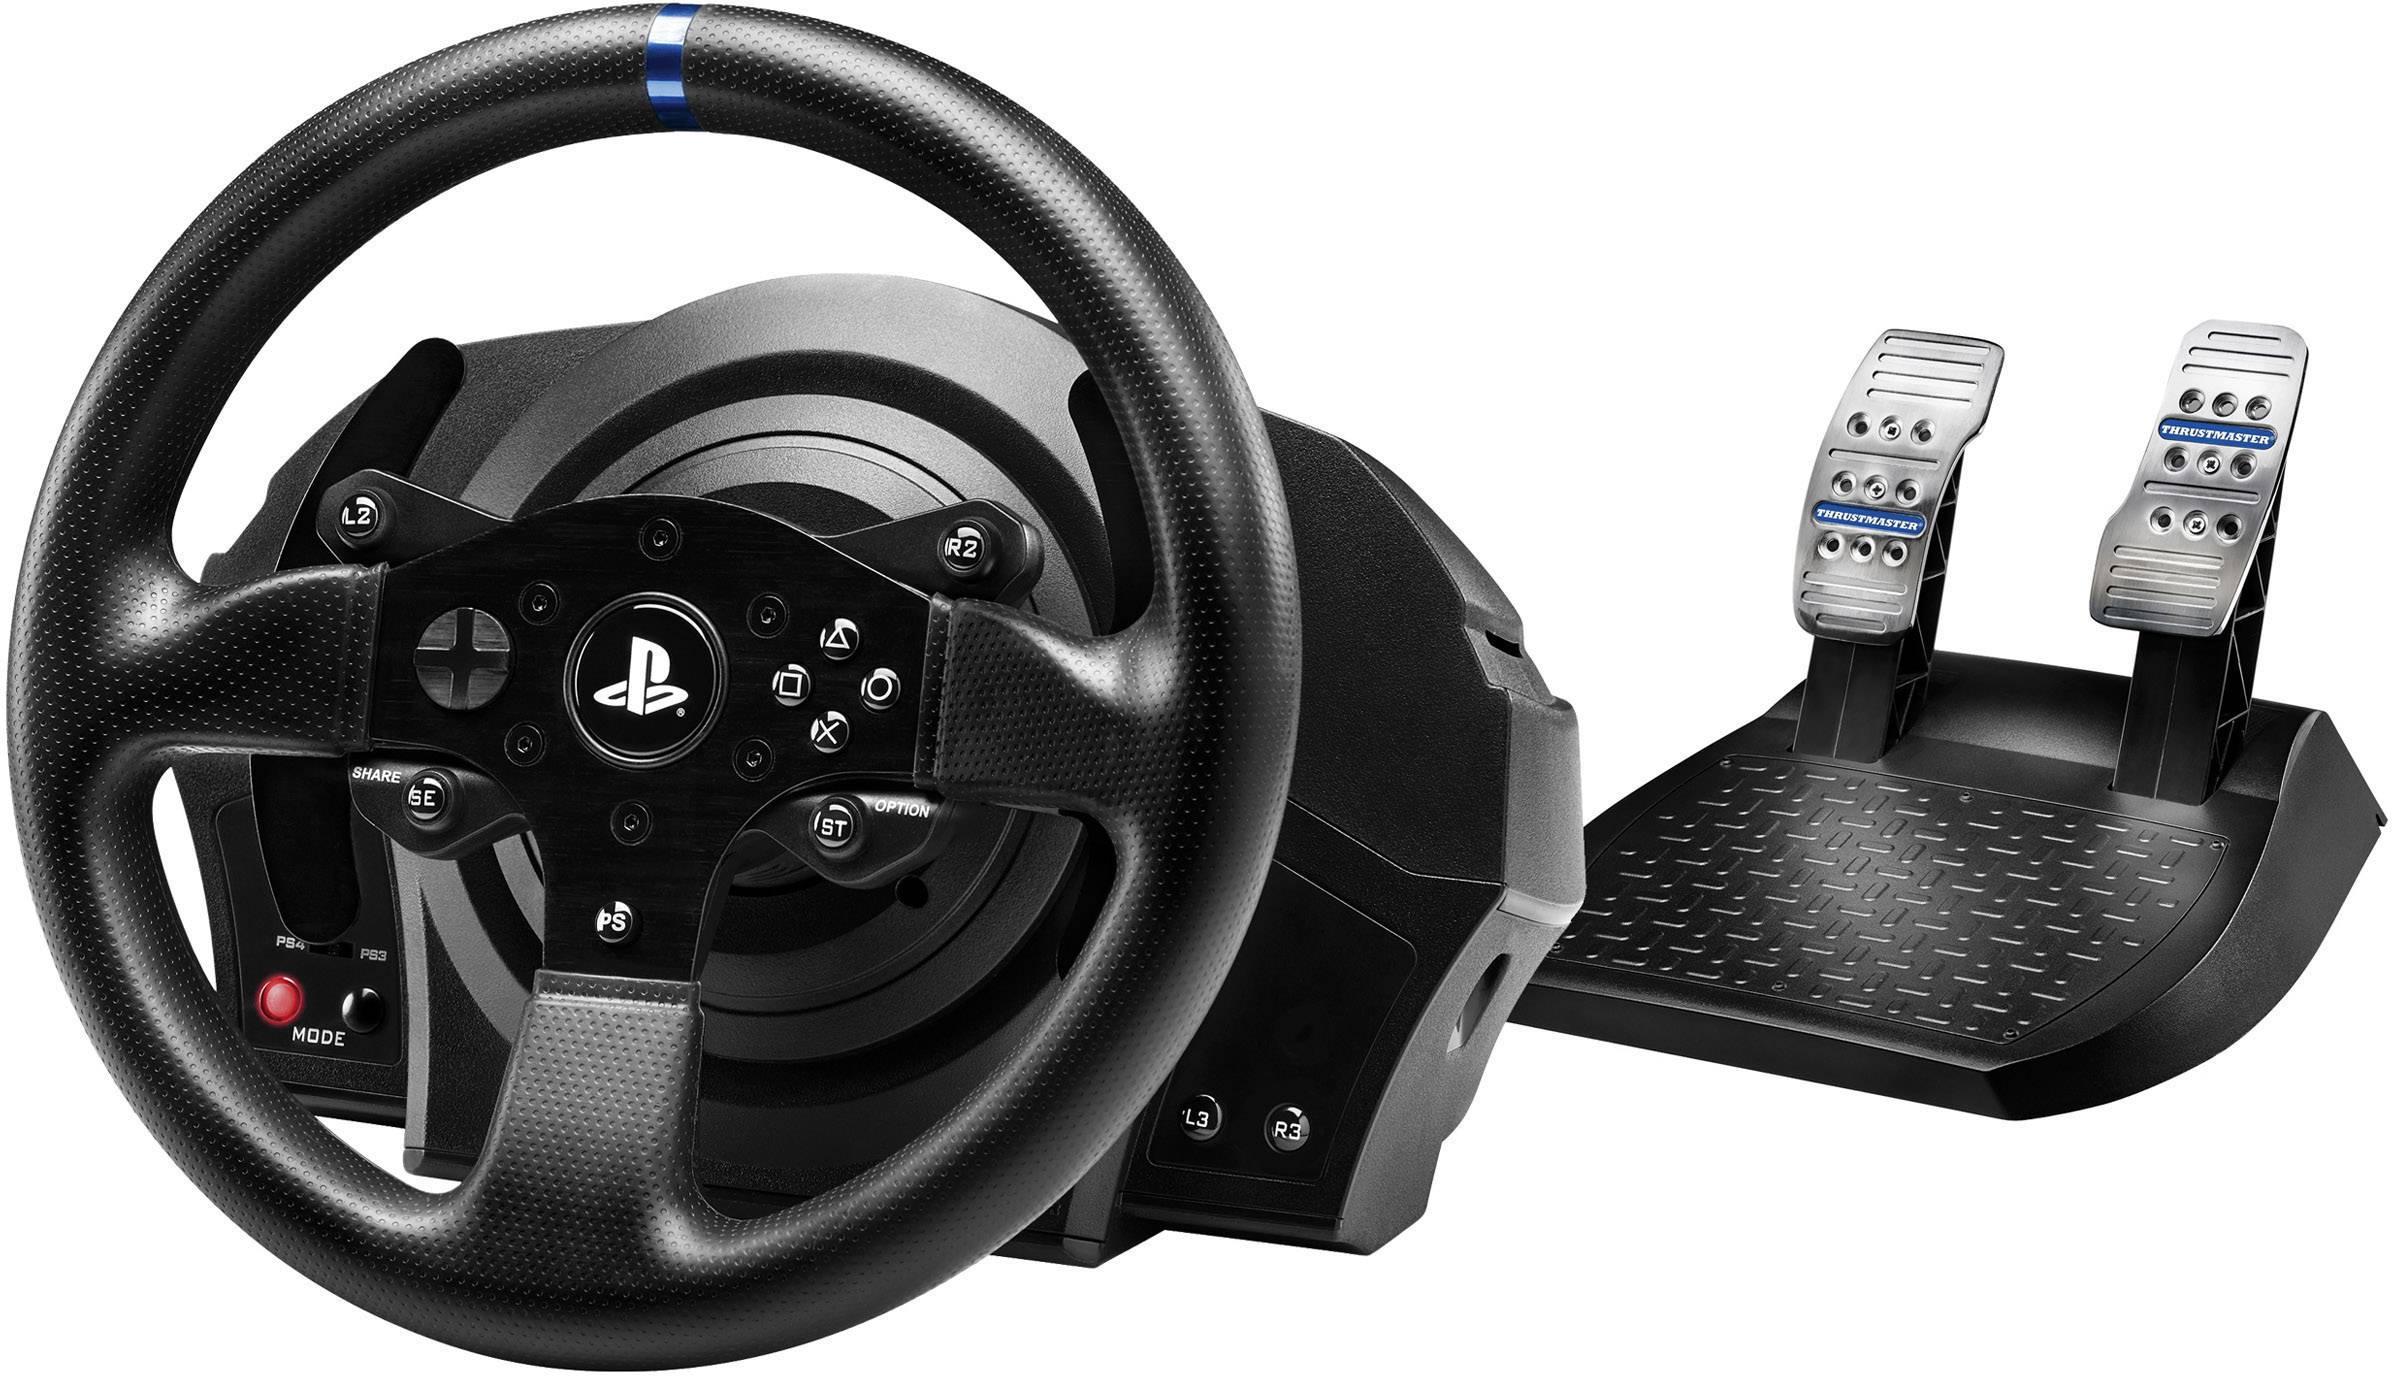 Volant Thrustmaster T300 RS Racing Wheel PlayStation 4, PlayStation 3, PC černá